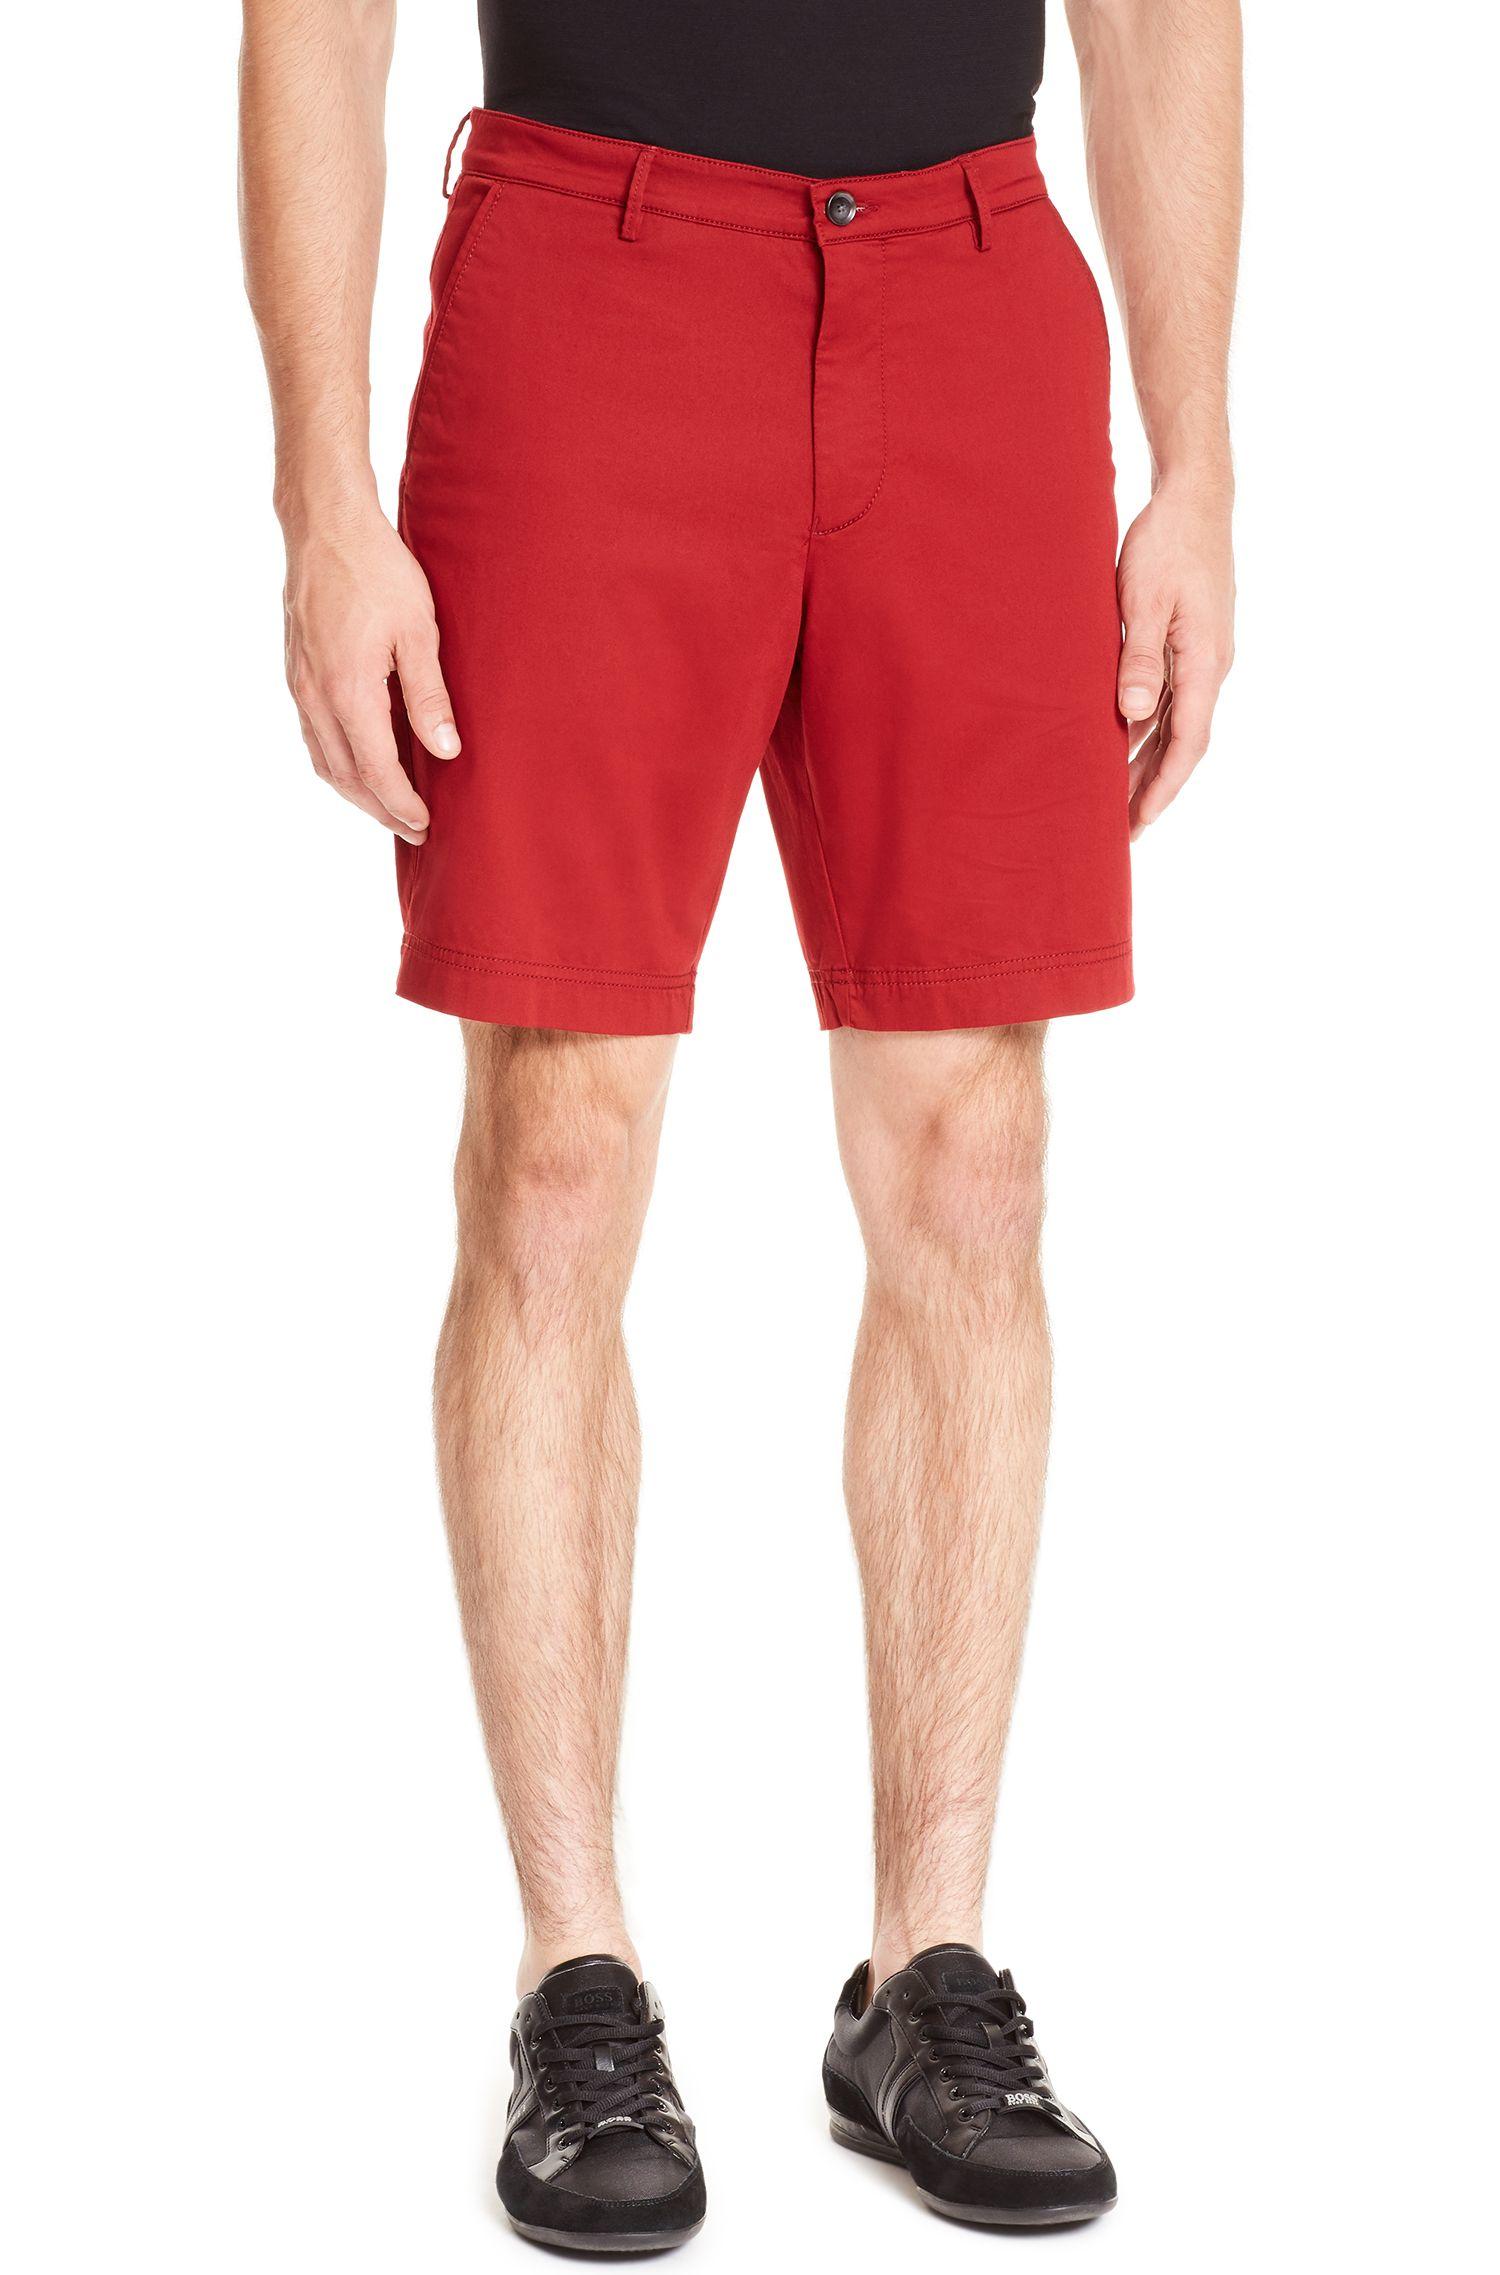 Stretch Cotton Short, Regular Fit | Crigan Short W, Red